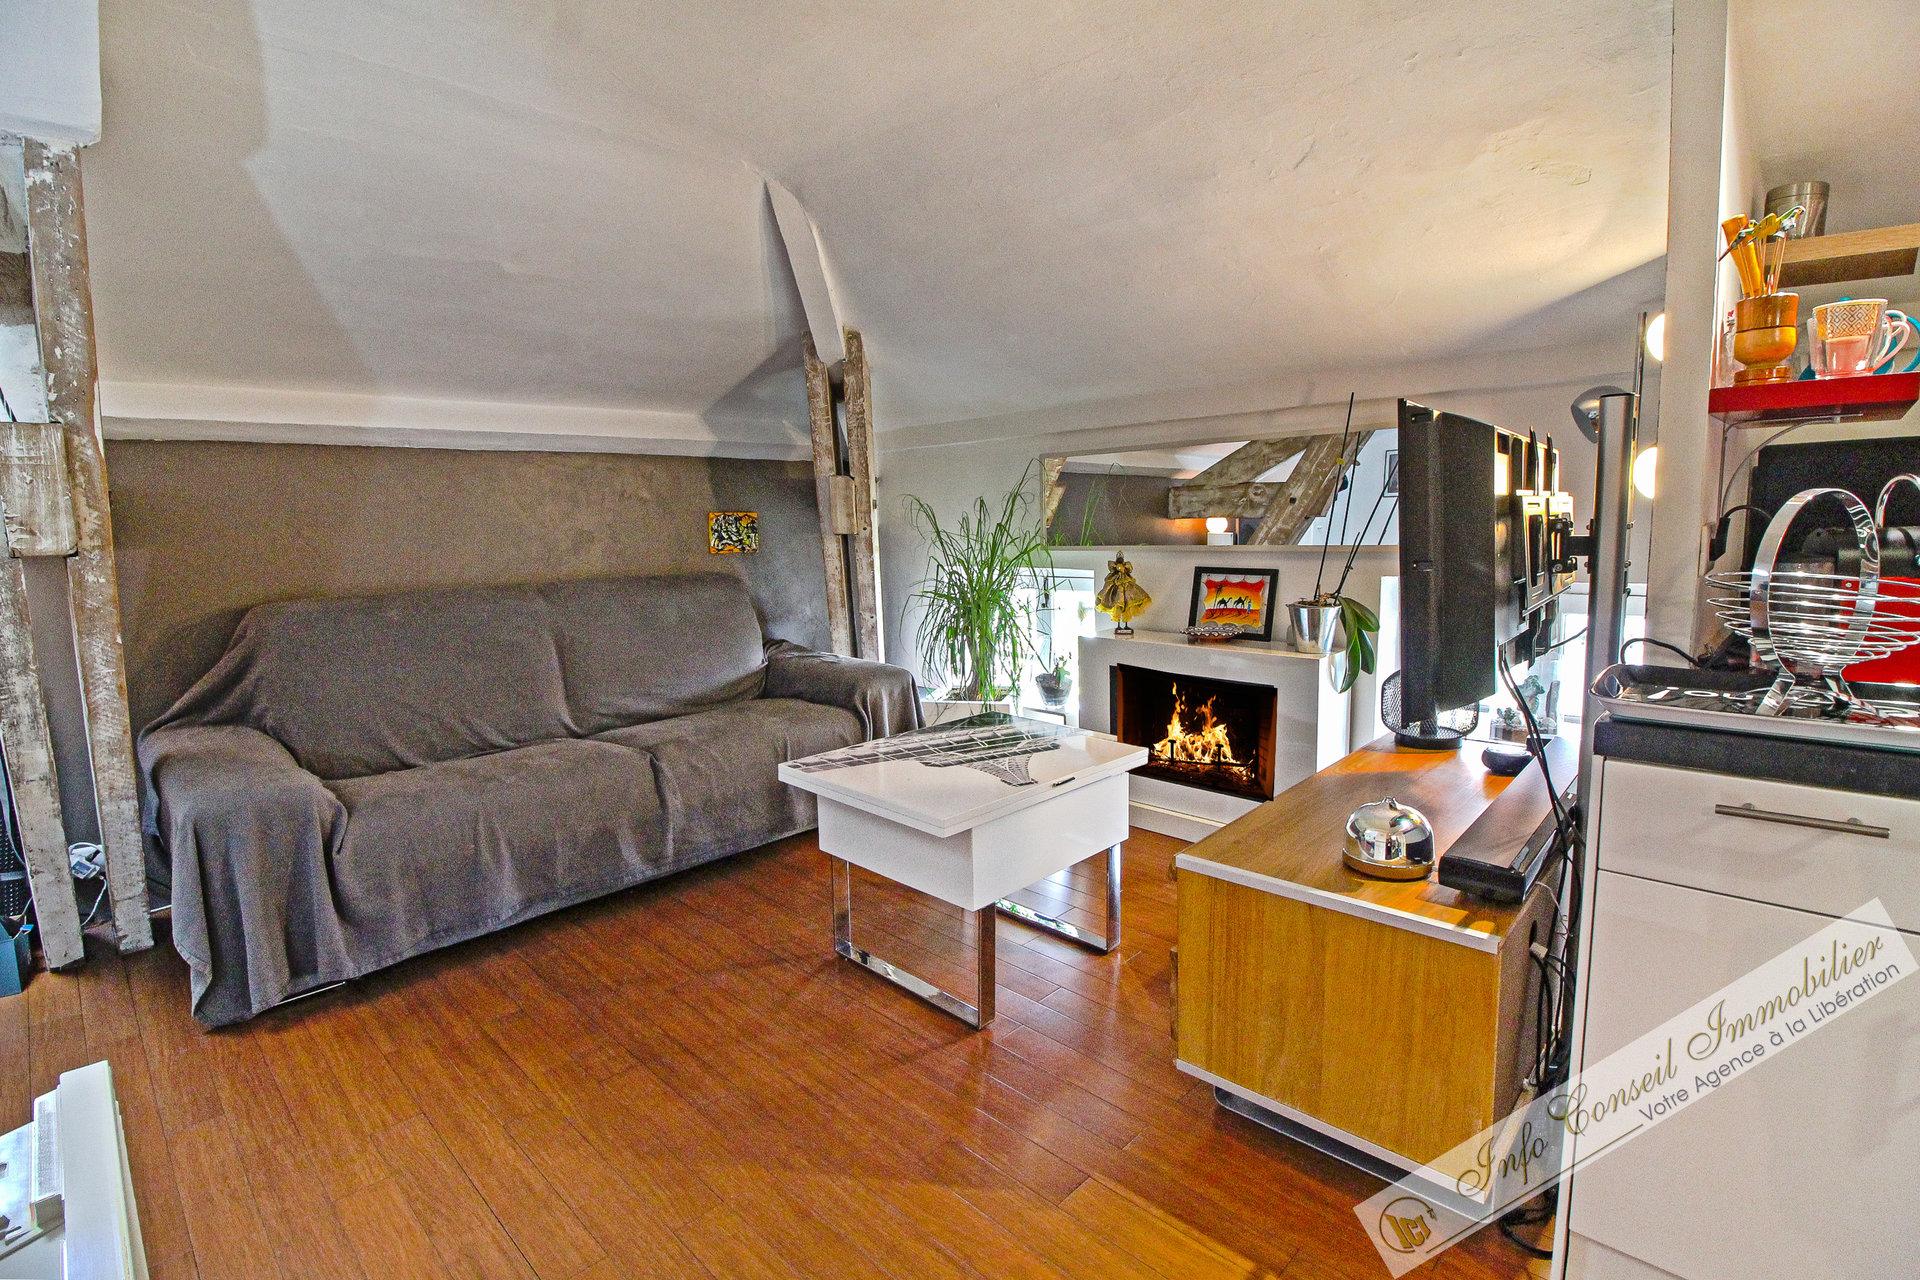 LIBERATION - Malausséna - Dernier étage - 27 m² - TBE - 145.000 €